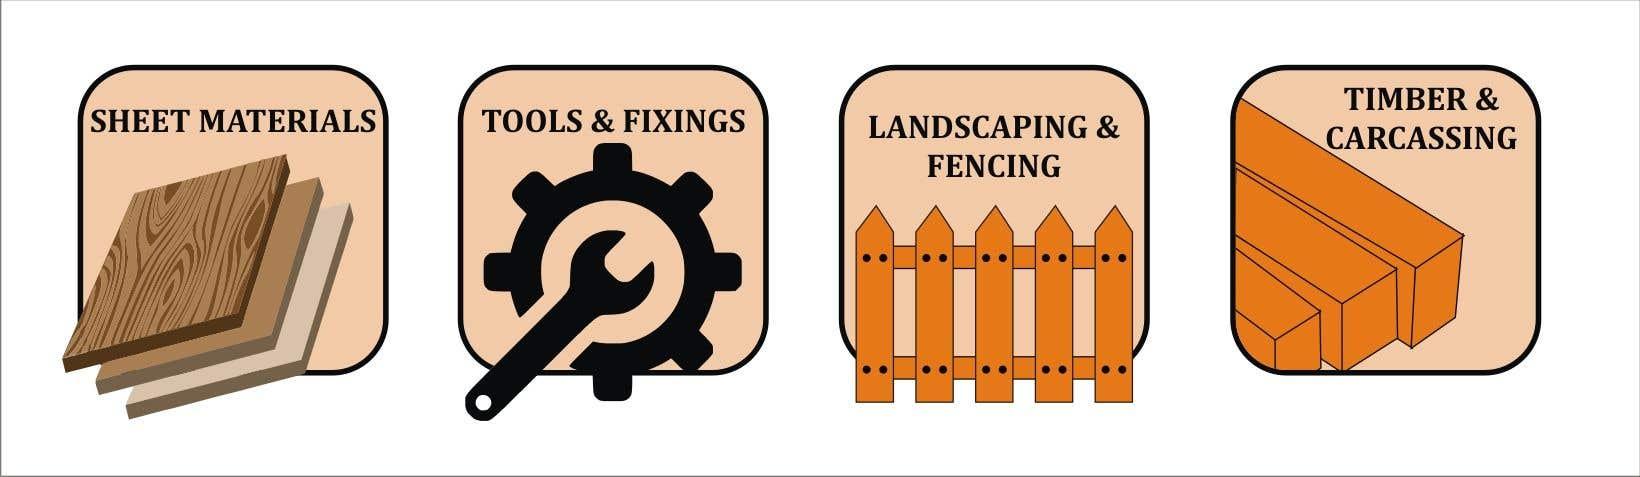 Penyertaan Peraduan #                                        5                                      untuk                                         Create 9 x Custom SVG Icons